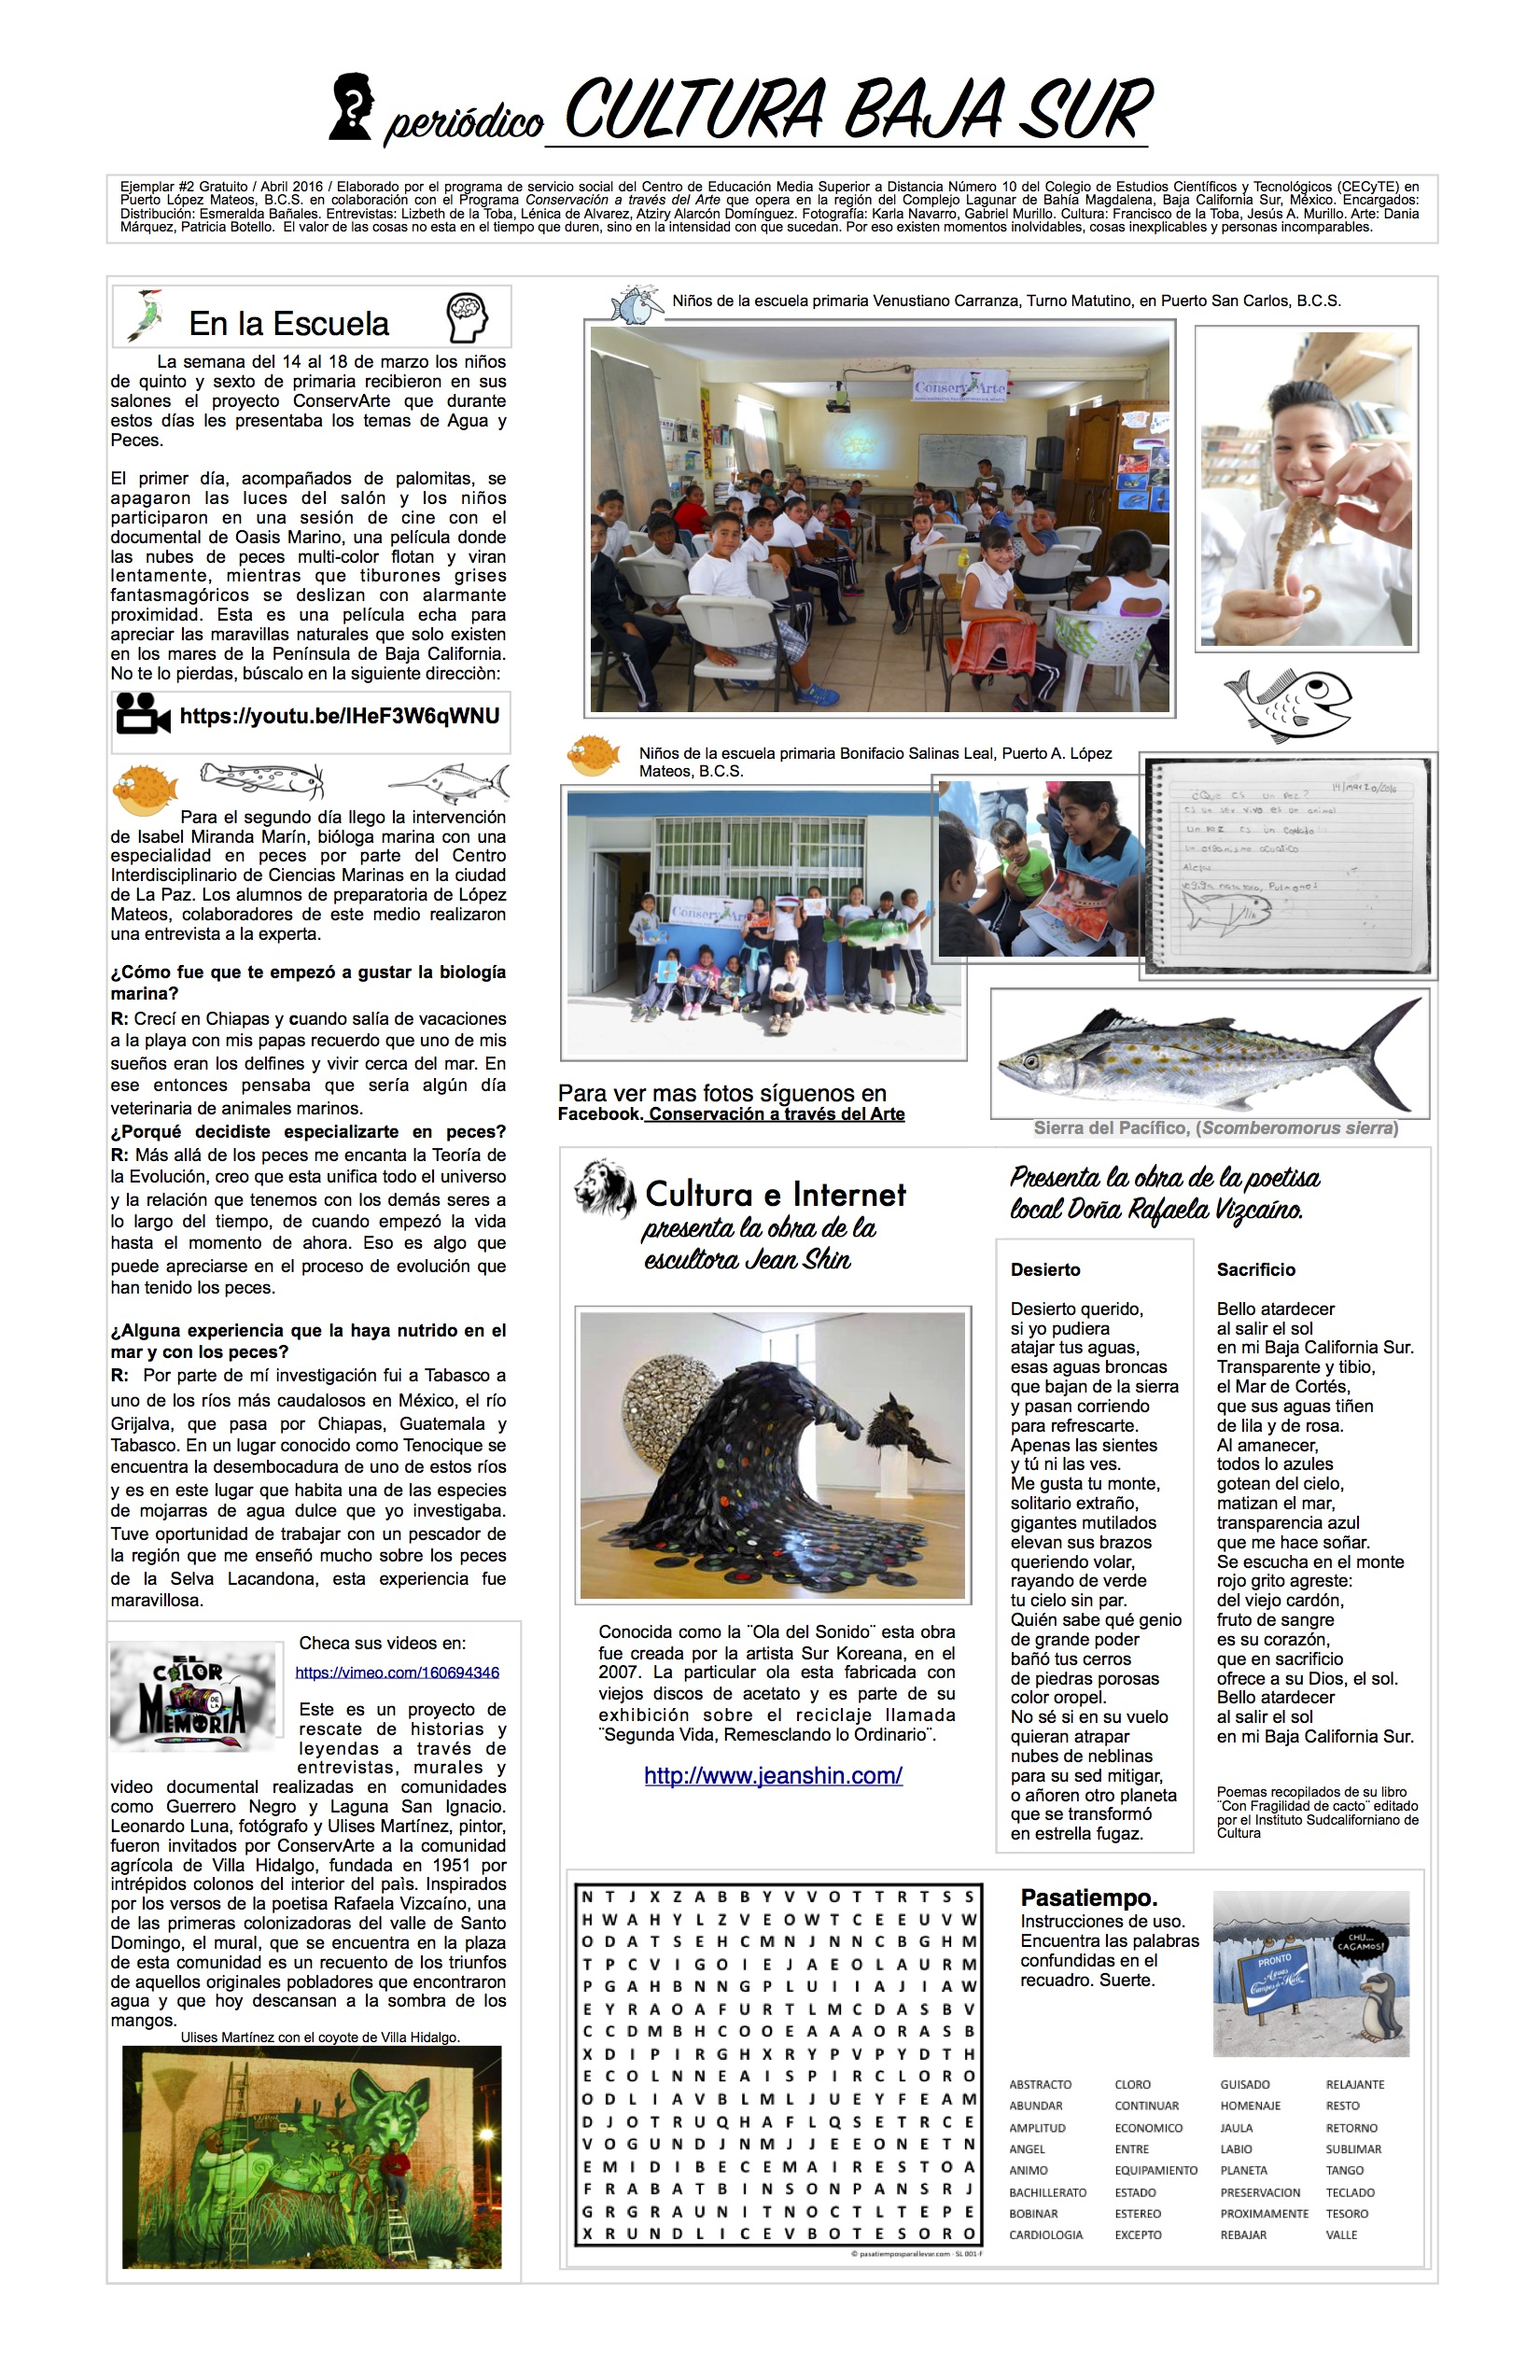 Periodico-Cultura-Baja-Sur-Abril